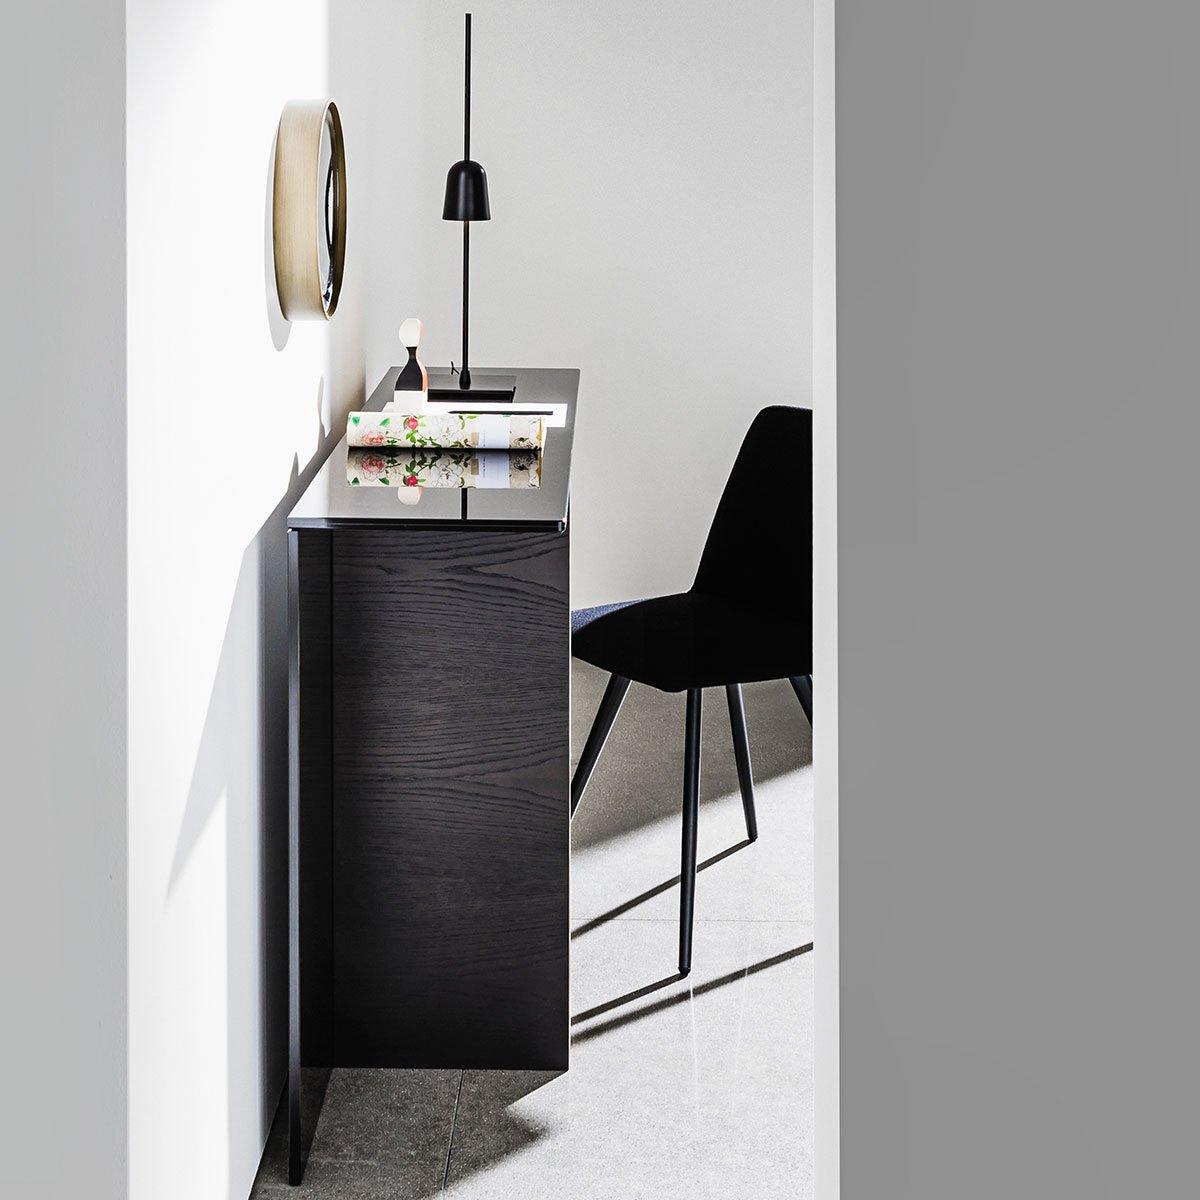 Sovet Regolo Wood Console Table